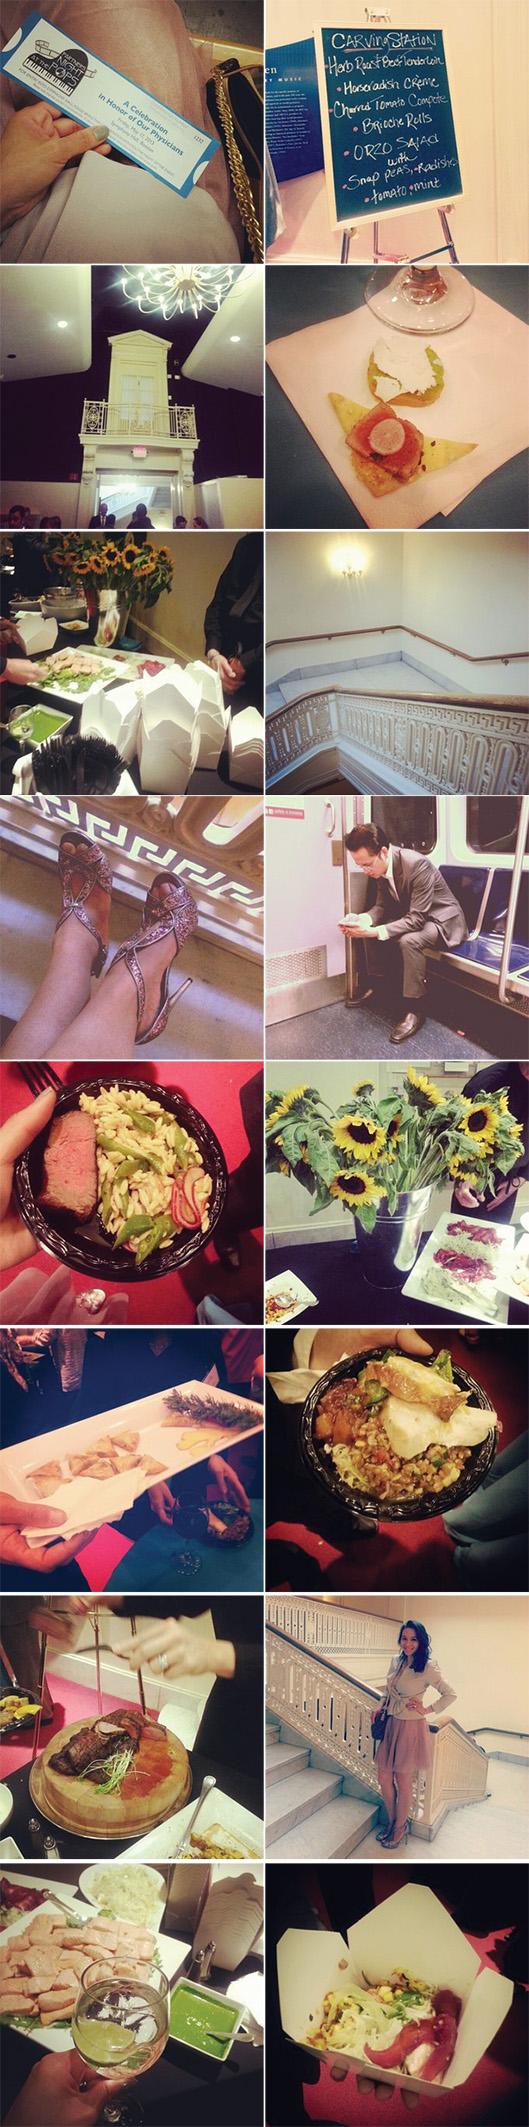 date night instagram